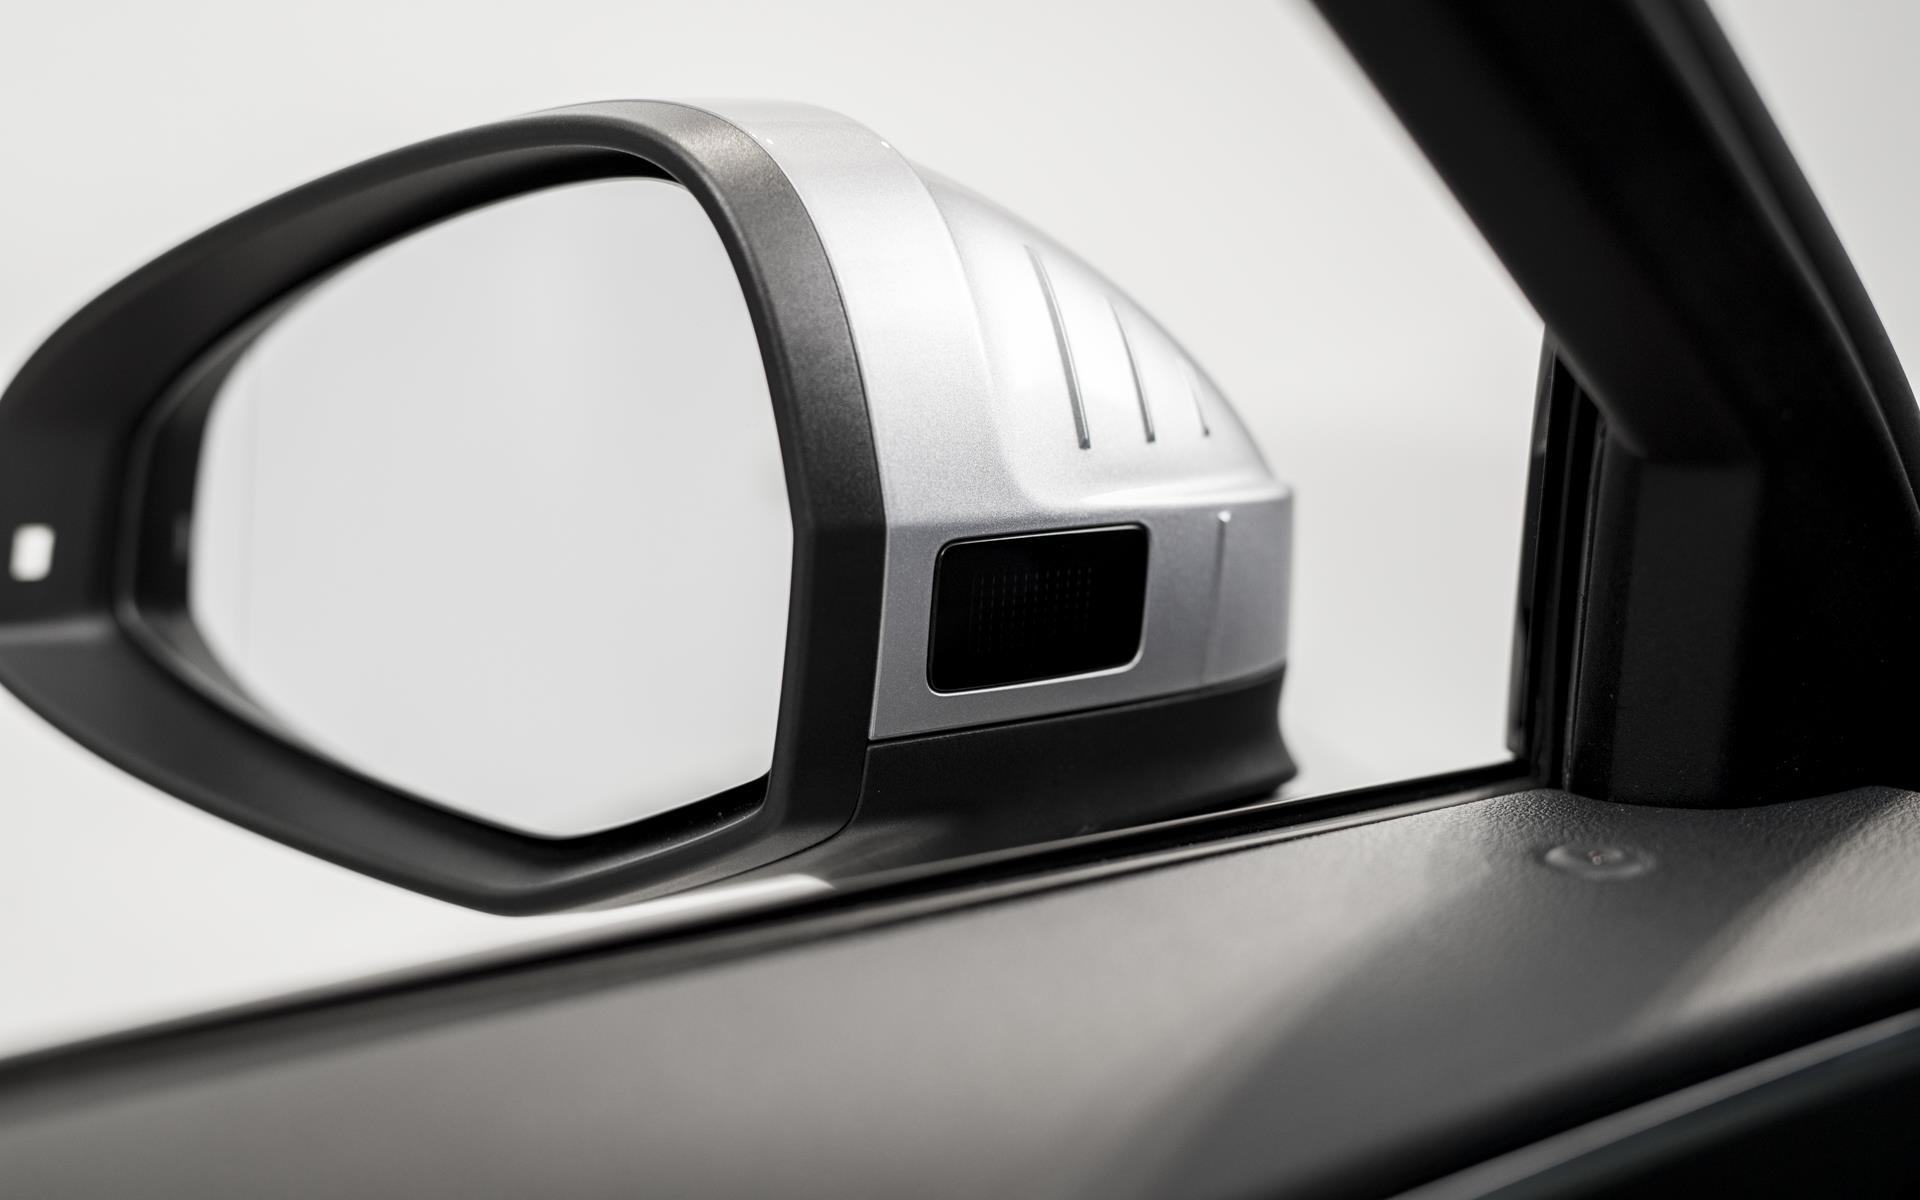 40 Avant 2,0 TDI Quattro S-Tronic 190HK Stc  image24